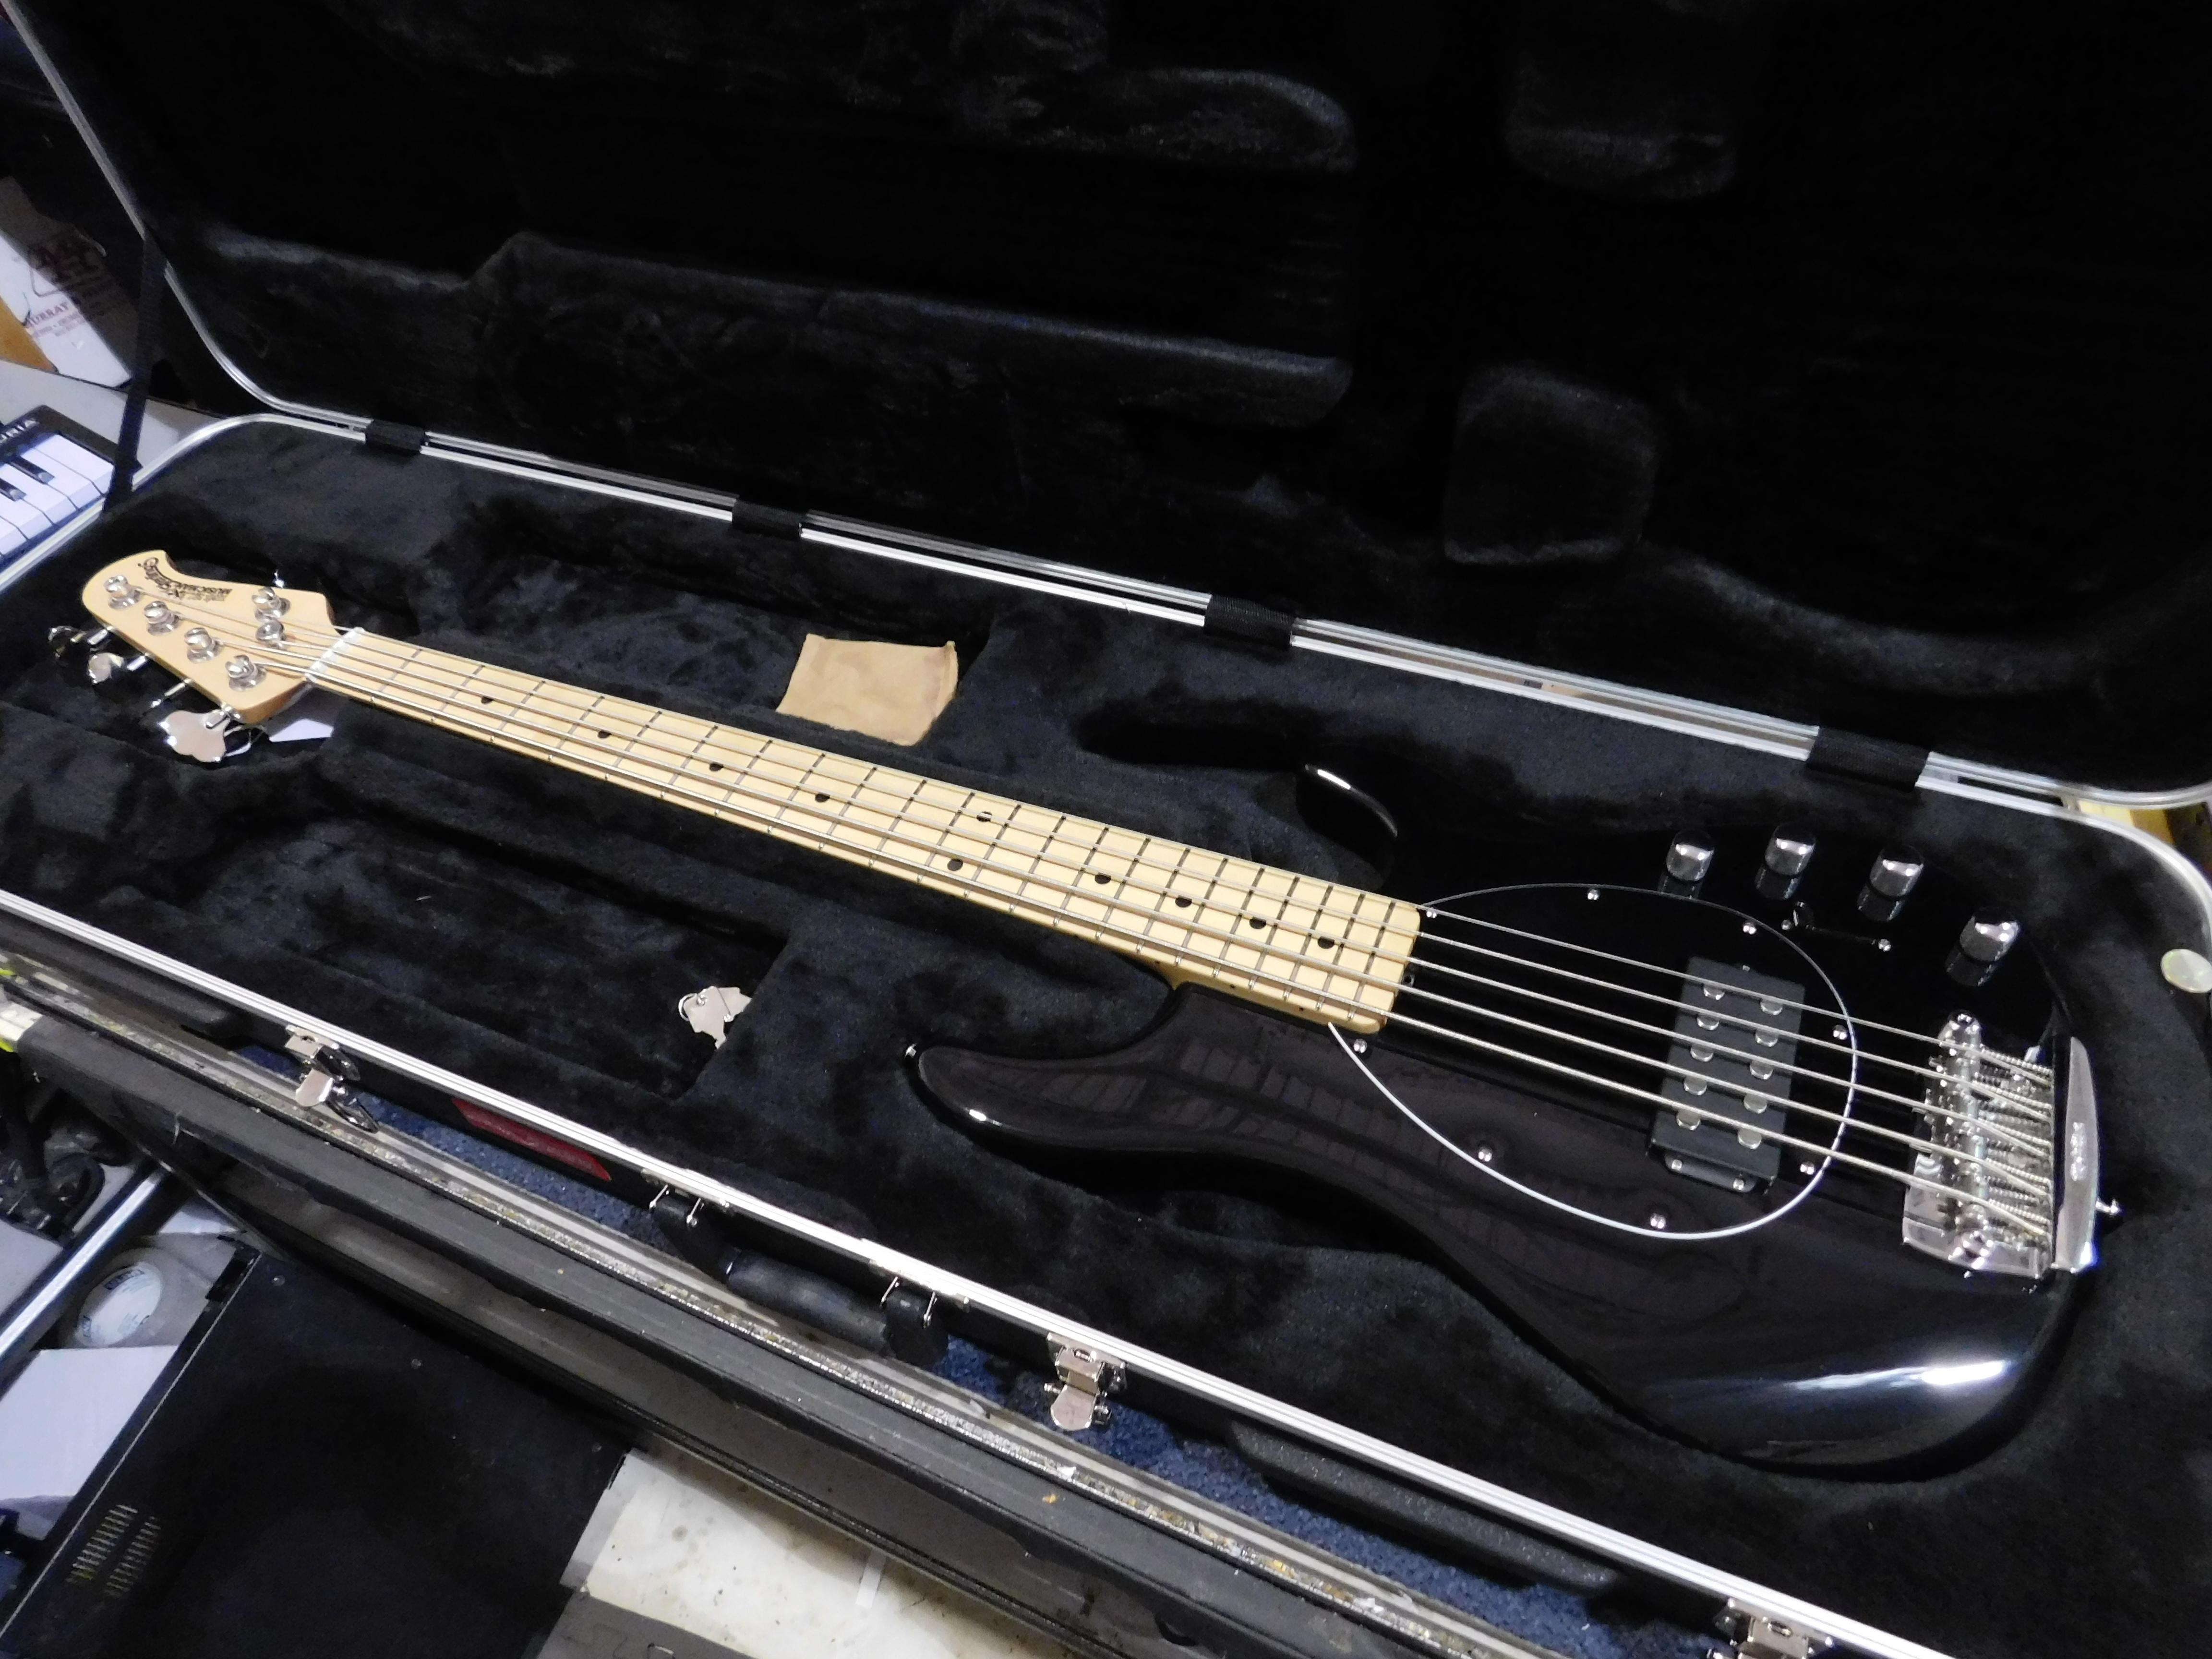 2017 ERNIE BALL MUSIC MAN STERLING 5 H 5-String Electric Bass HSC Black